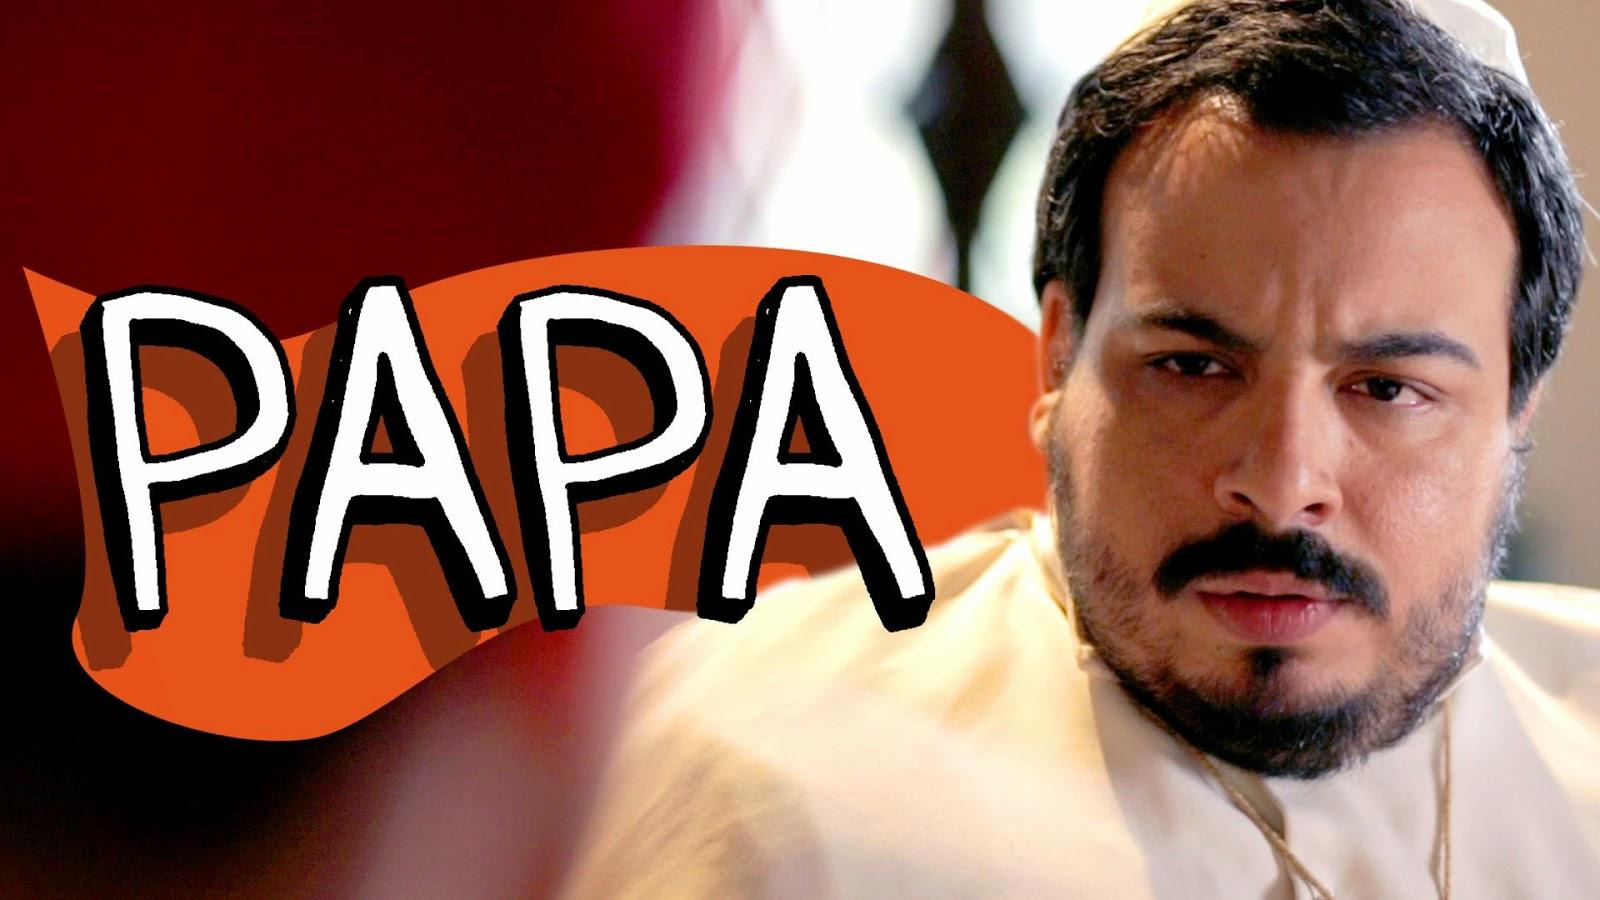 http://questoeseargumentos.blogspot.com.br/2014/10/papa.html